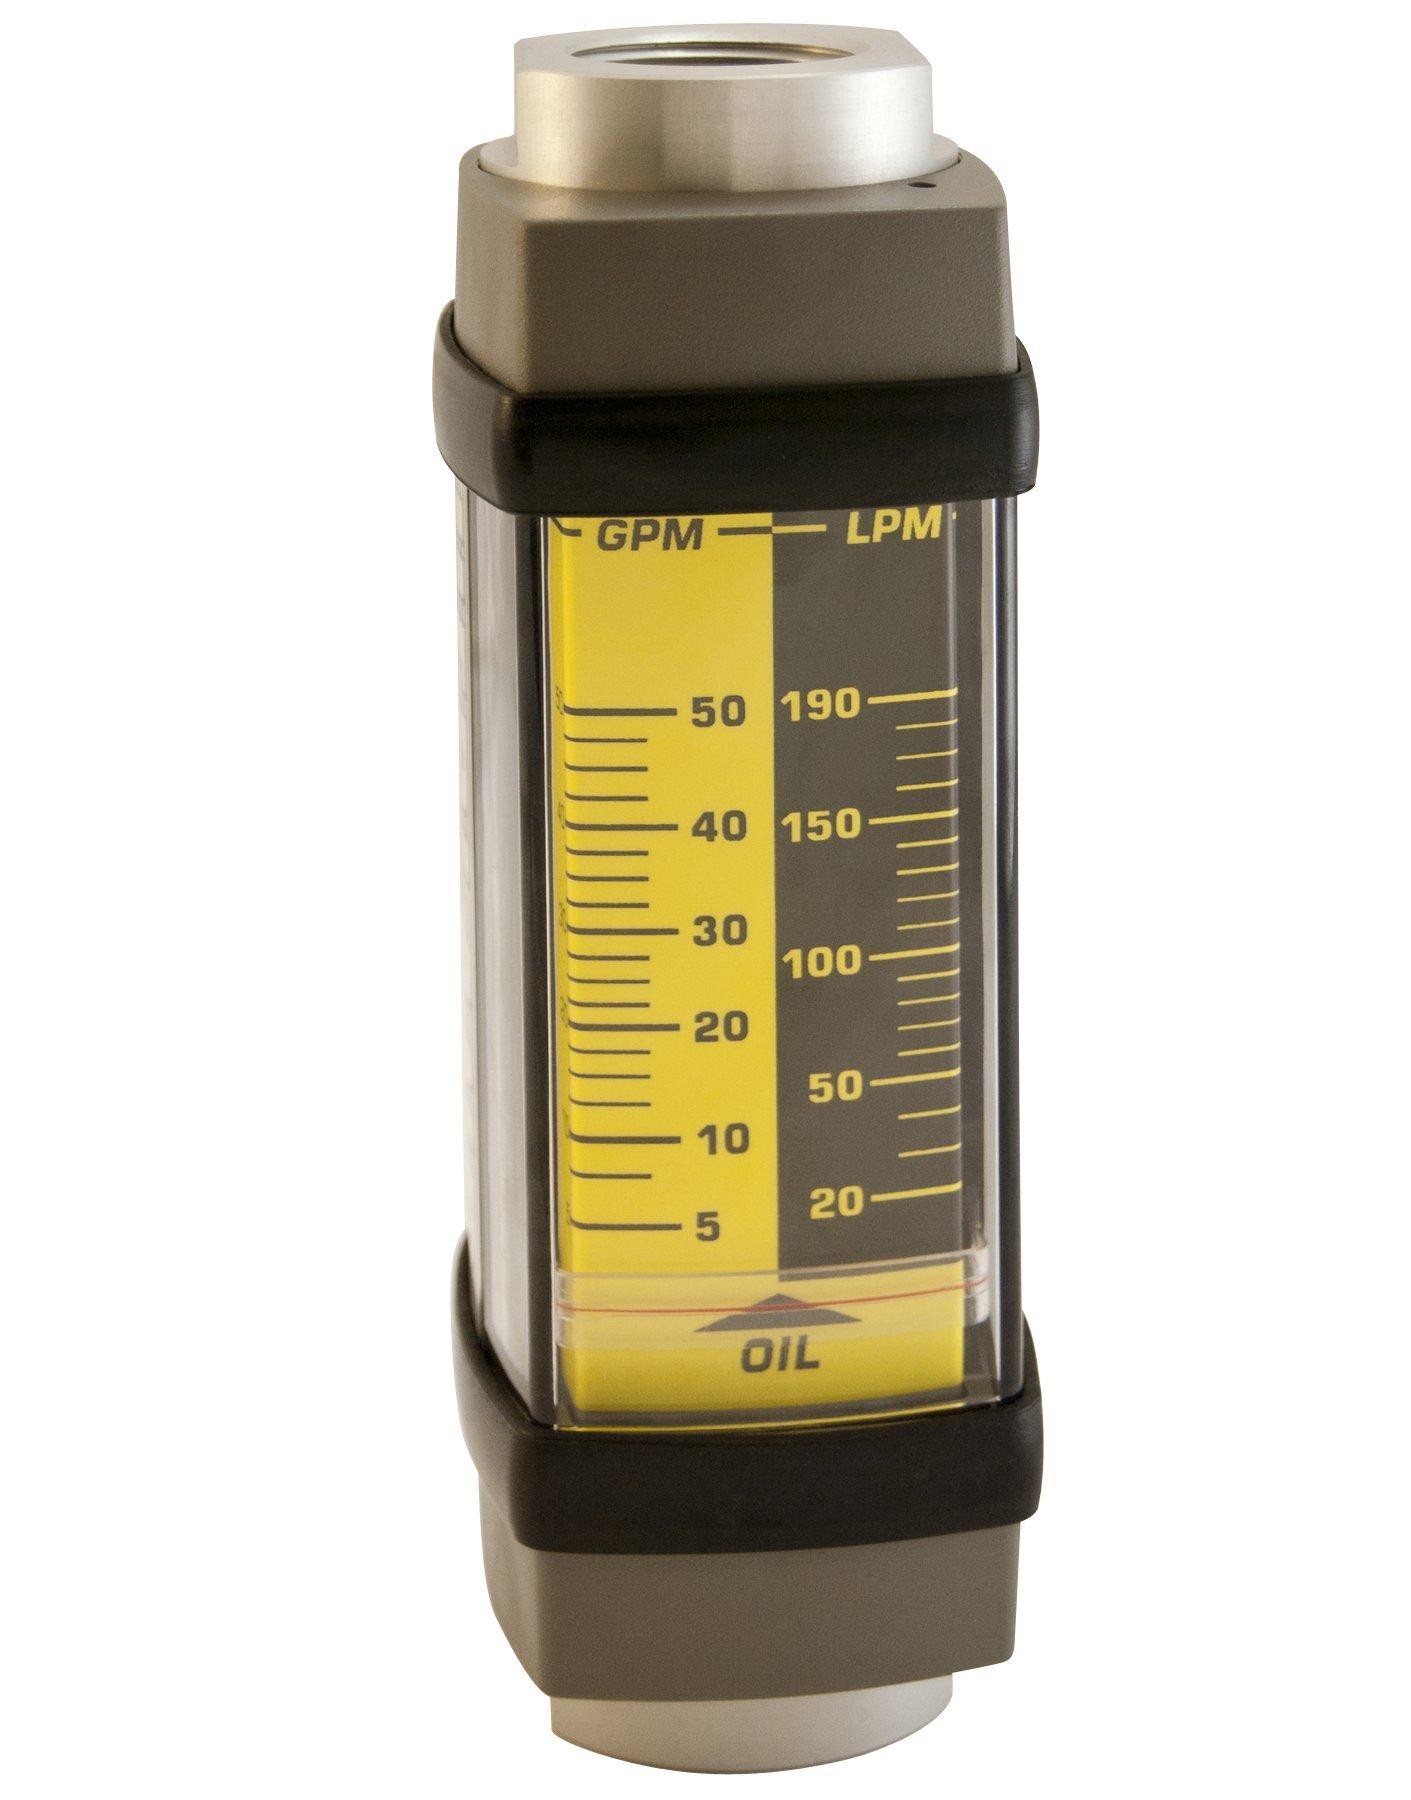 Hedland H601A-010 Flowmeter, Aluminum, For Use With Oil and Petroleum Fluids, 1 - 10 gpm Flow Range, 1/2'' NPT Female